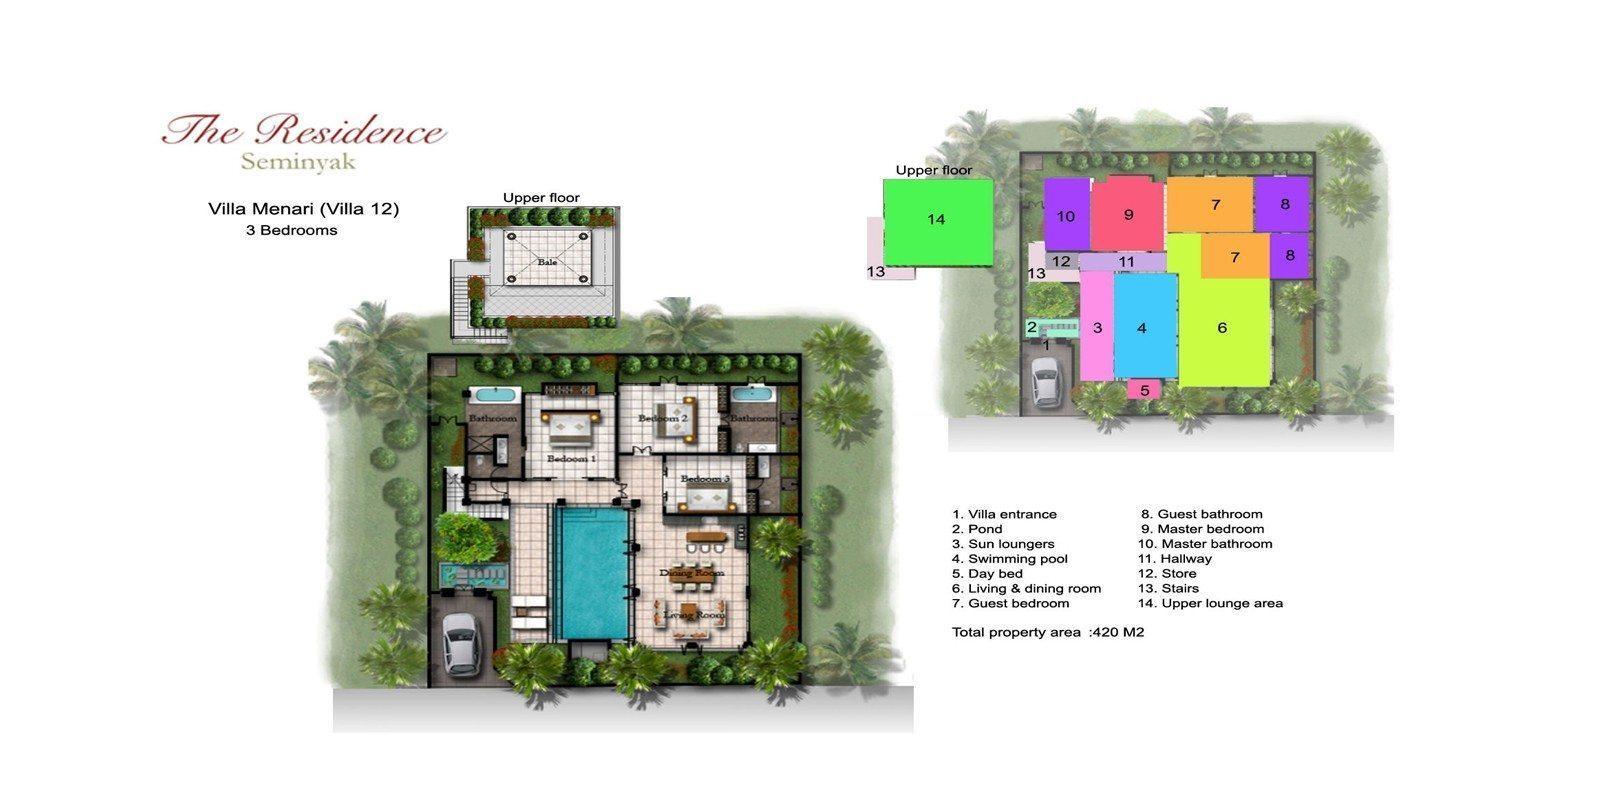 Villa Menari Residence Floorplan   Seminyak, Bali